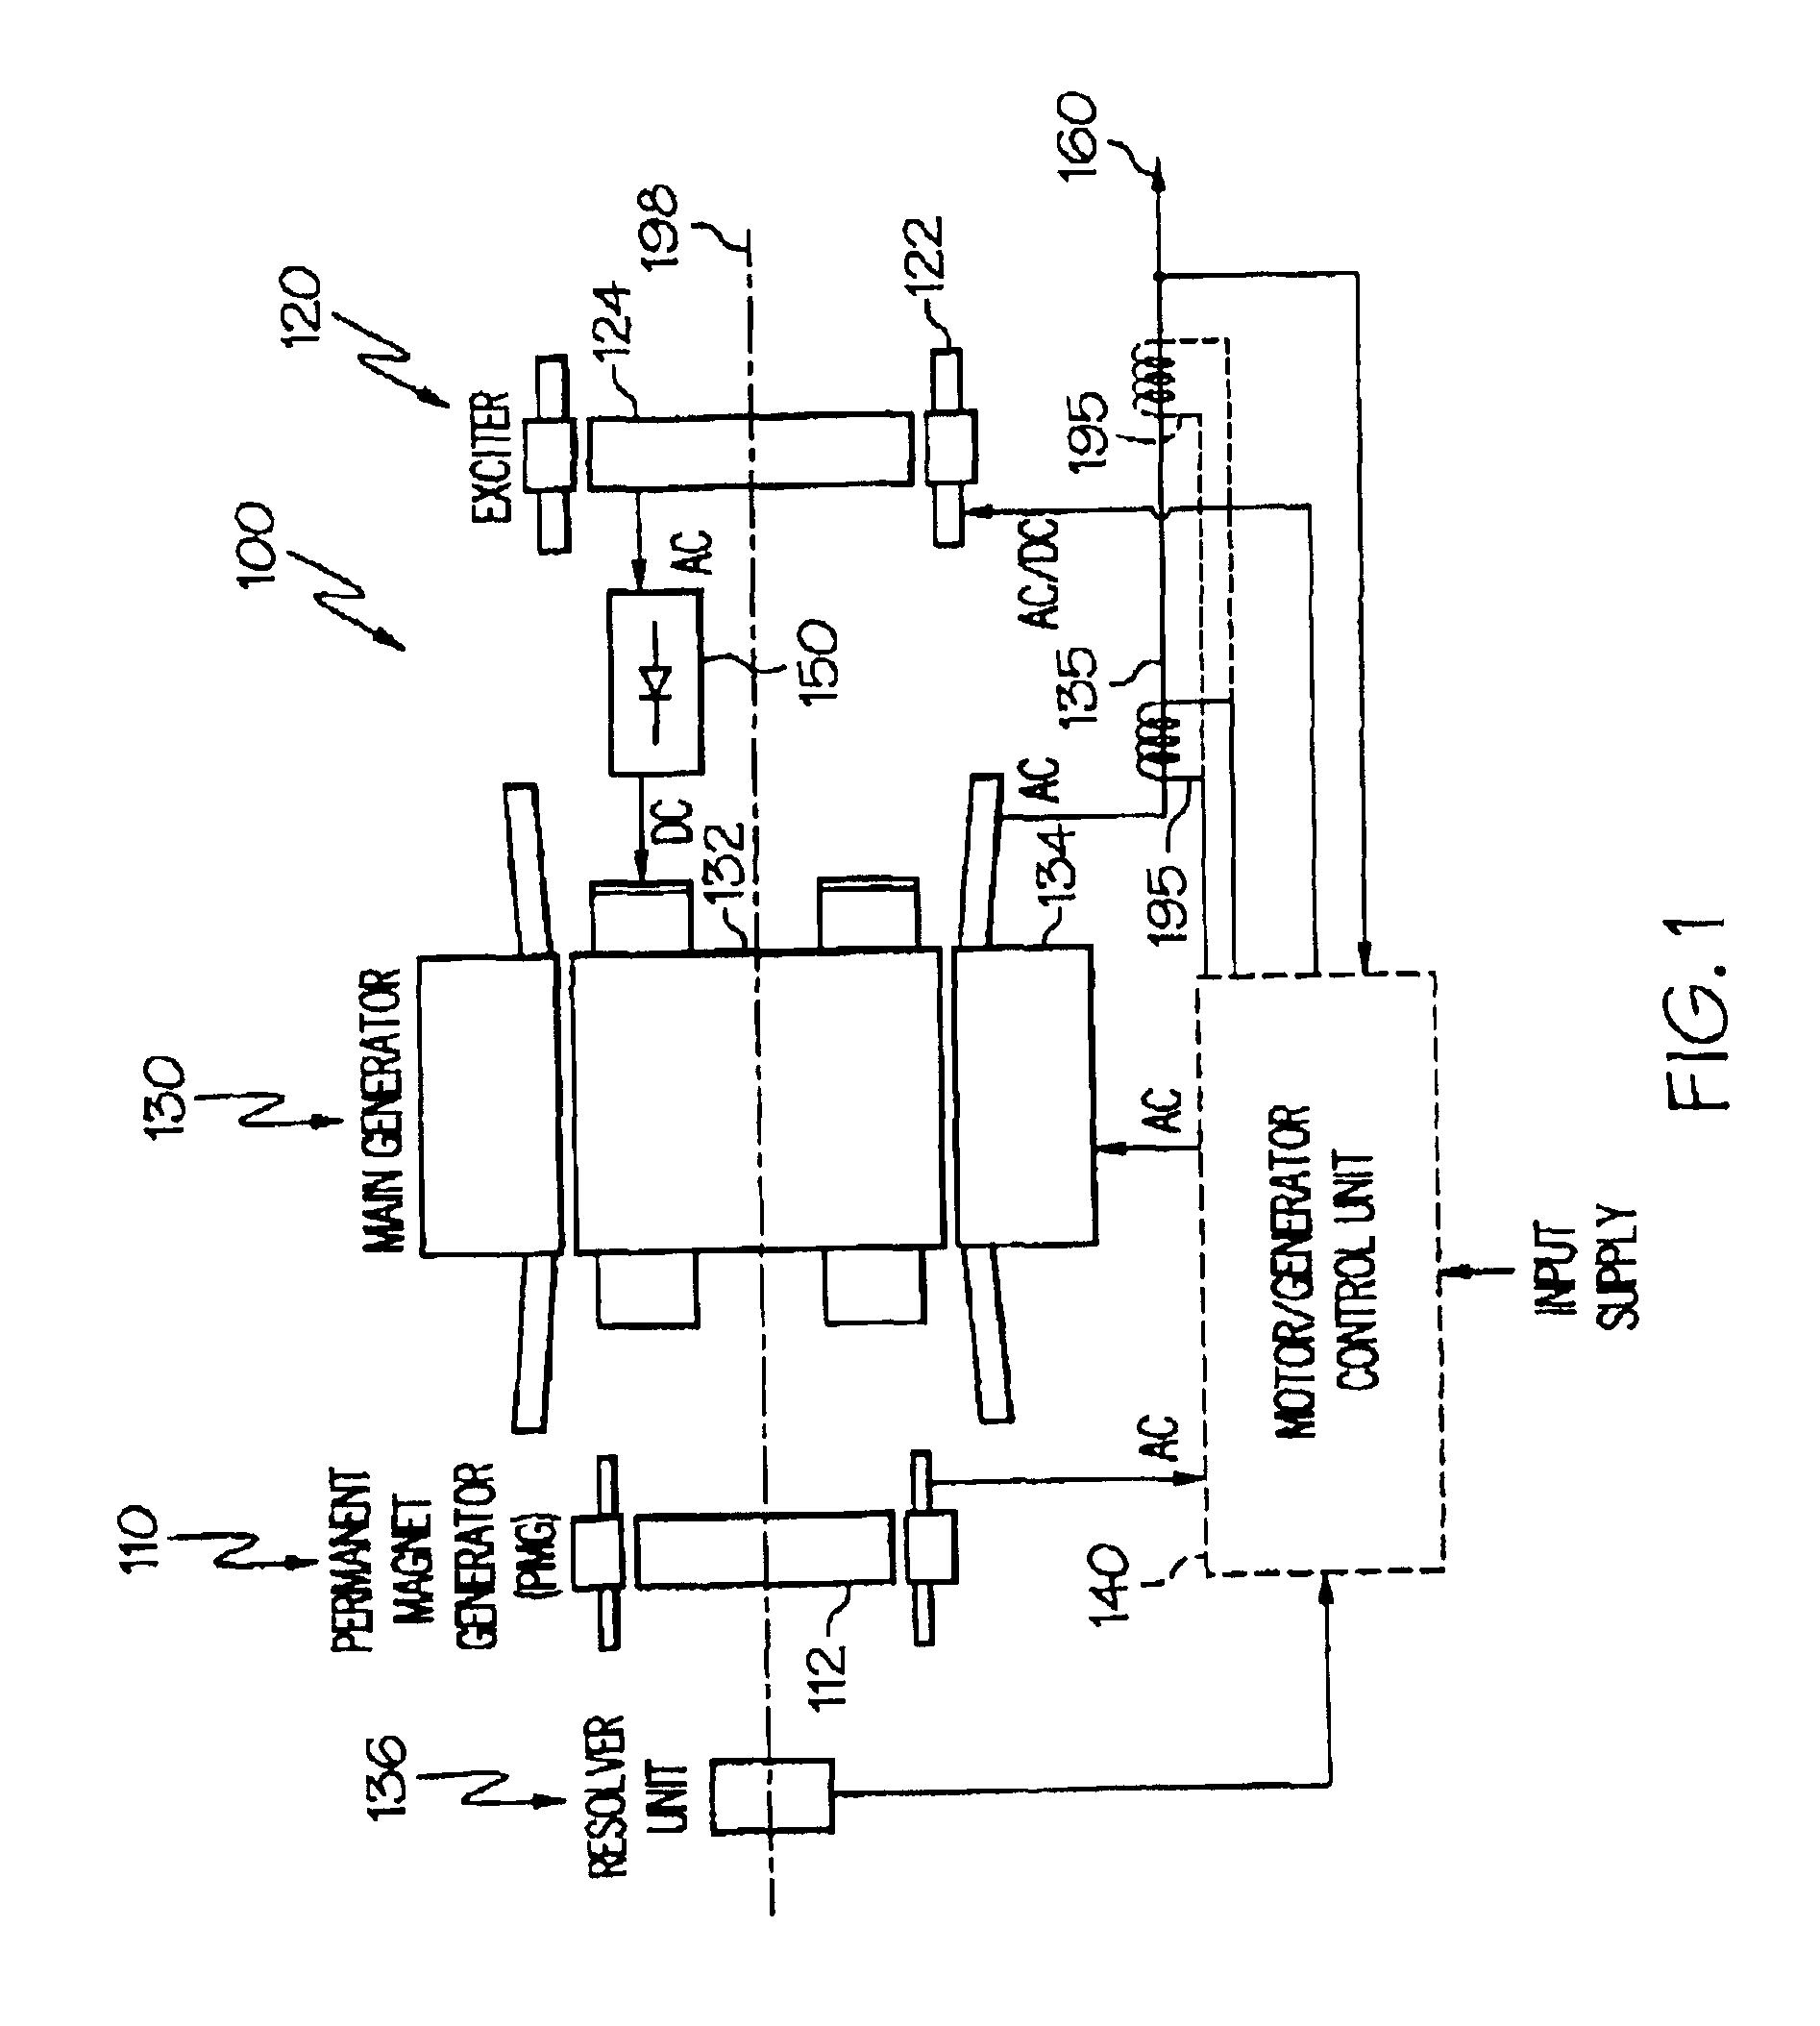 Wound Rotor Motor Wiring Diagrams GE Electric Motor Wiring